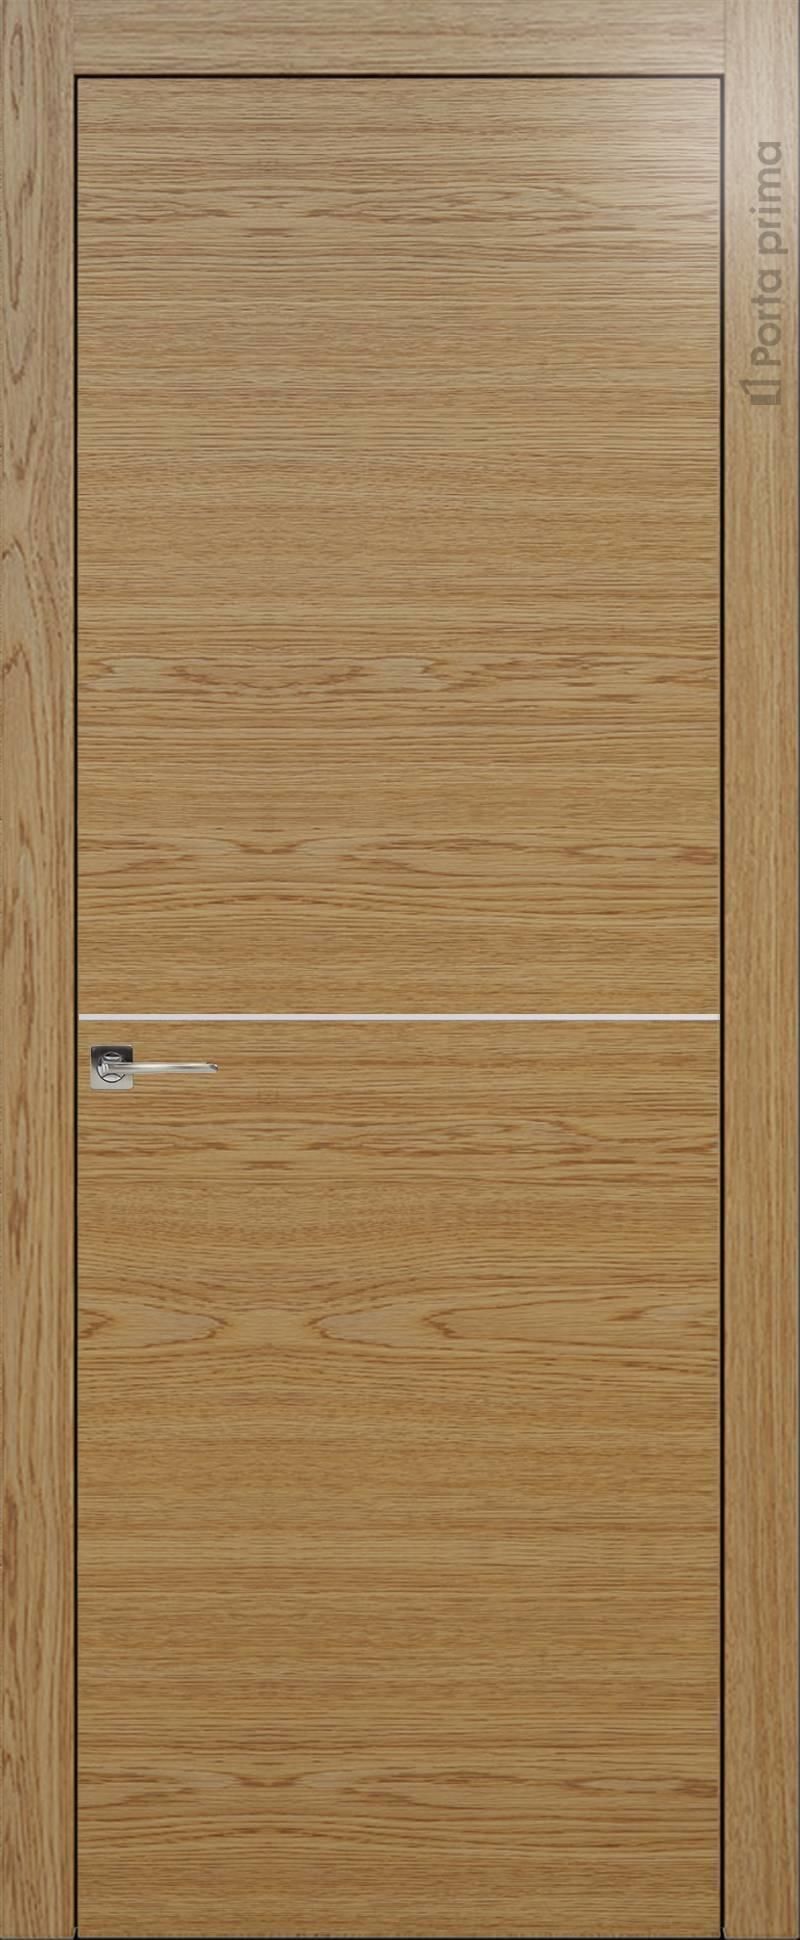 Tivoli Б-3 цвет - Дуб карамель Без стекла (ДГ)